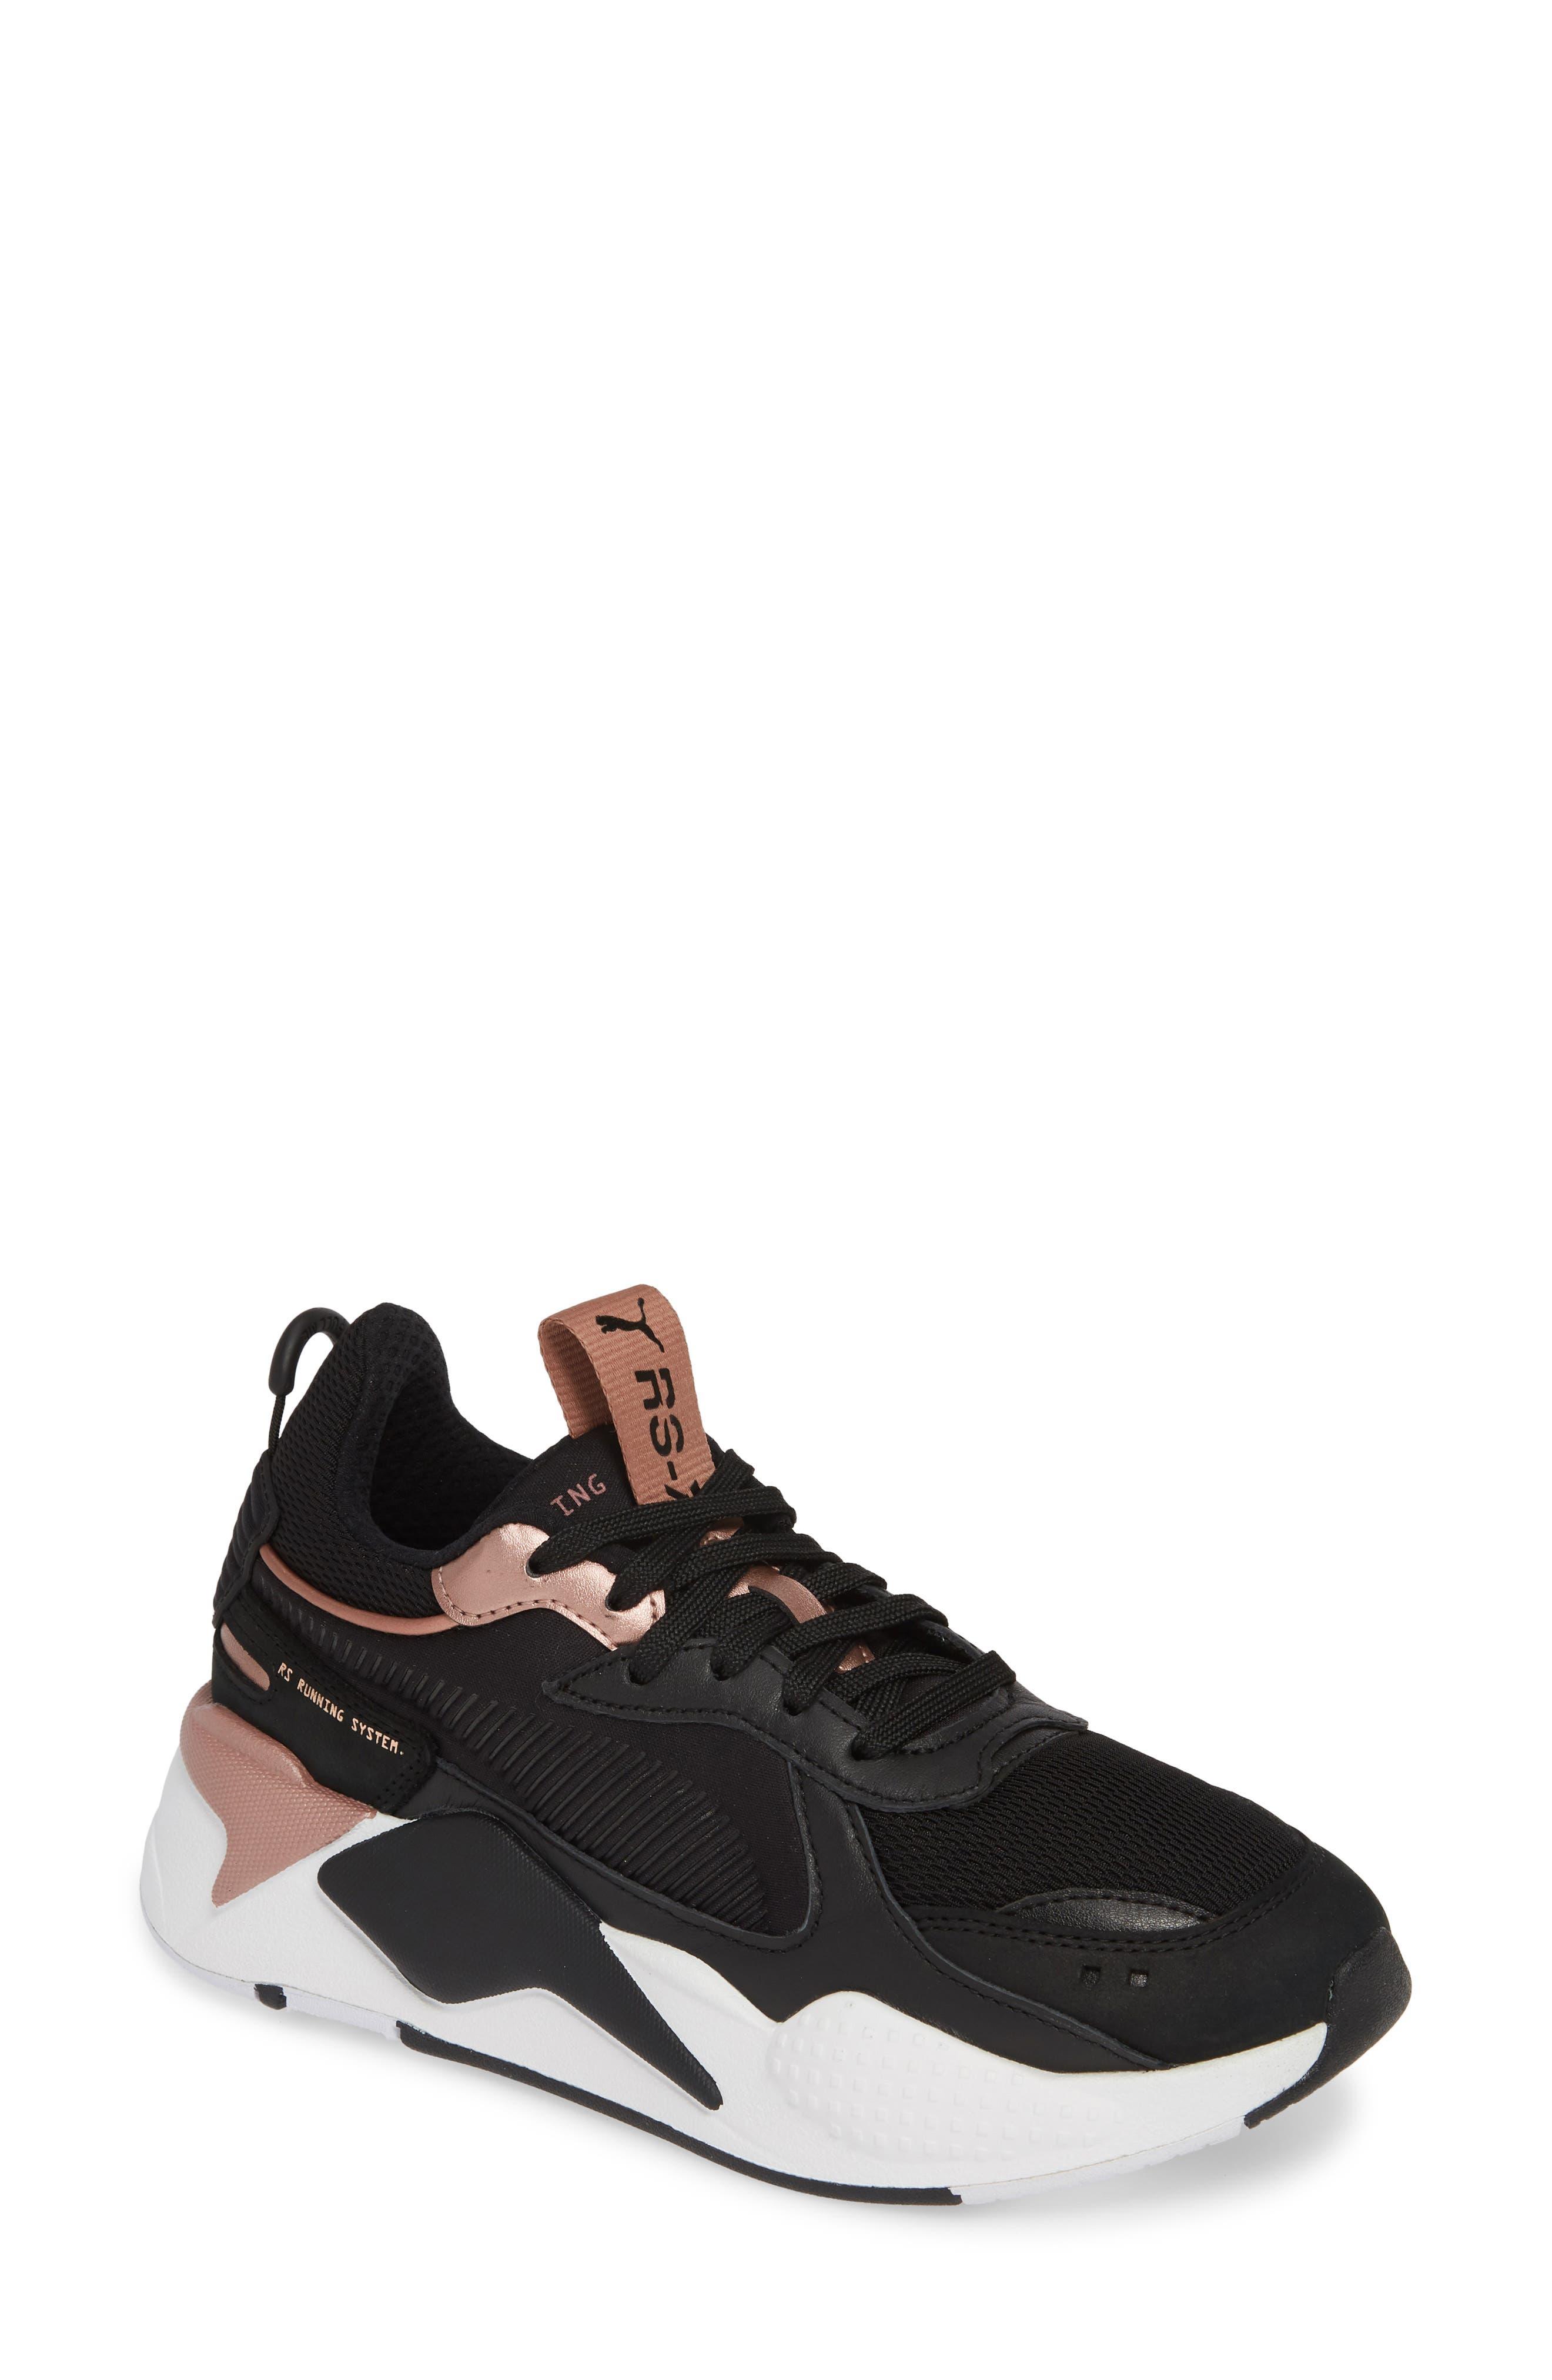 PUMA, RS-X Trophy Sneaker, Main thumbnail 1, color, BLACK/ ROSE GOLD